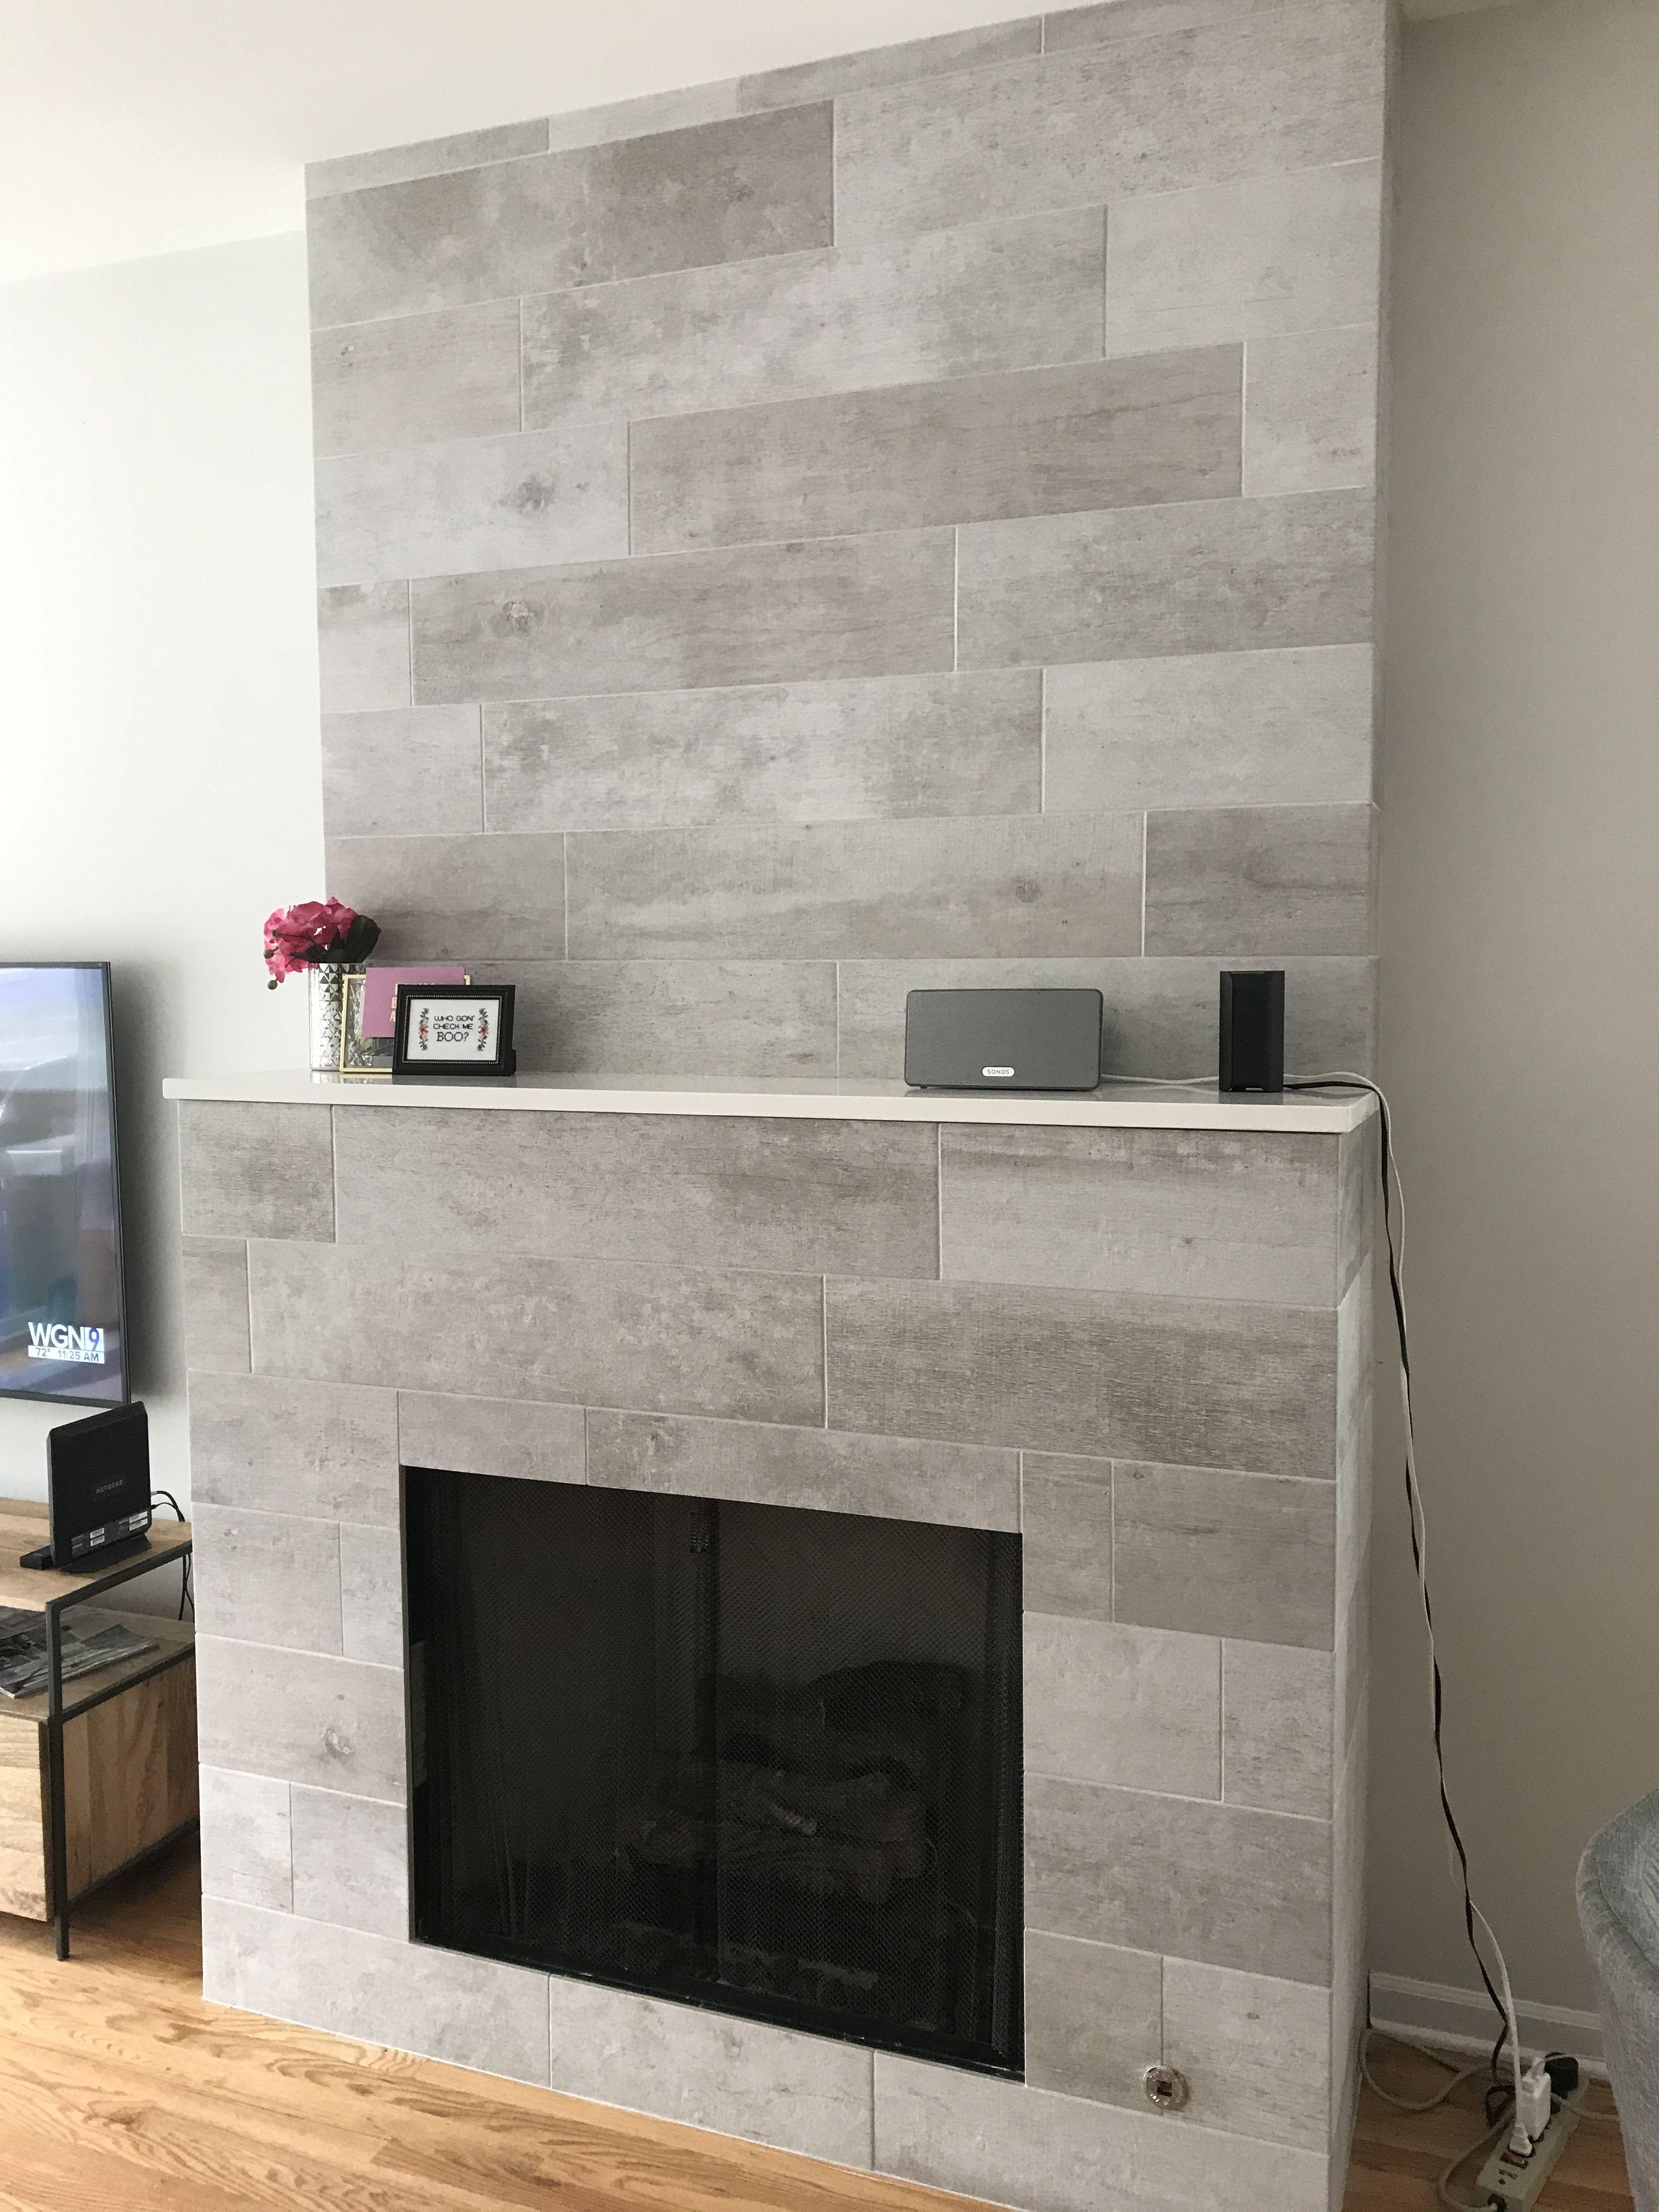 Modern Rustic Fireplace Cool Amp Sleek Wood Grain Gray Grey Porcelain Tile From Tile Outlet